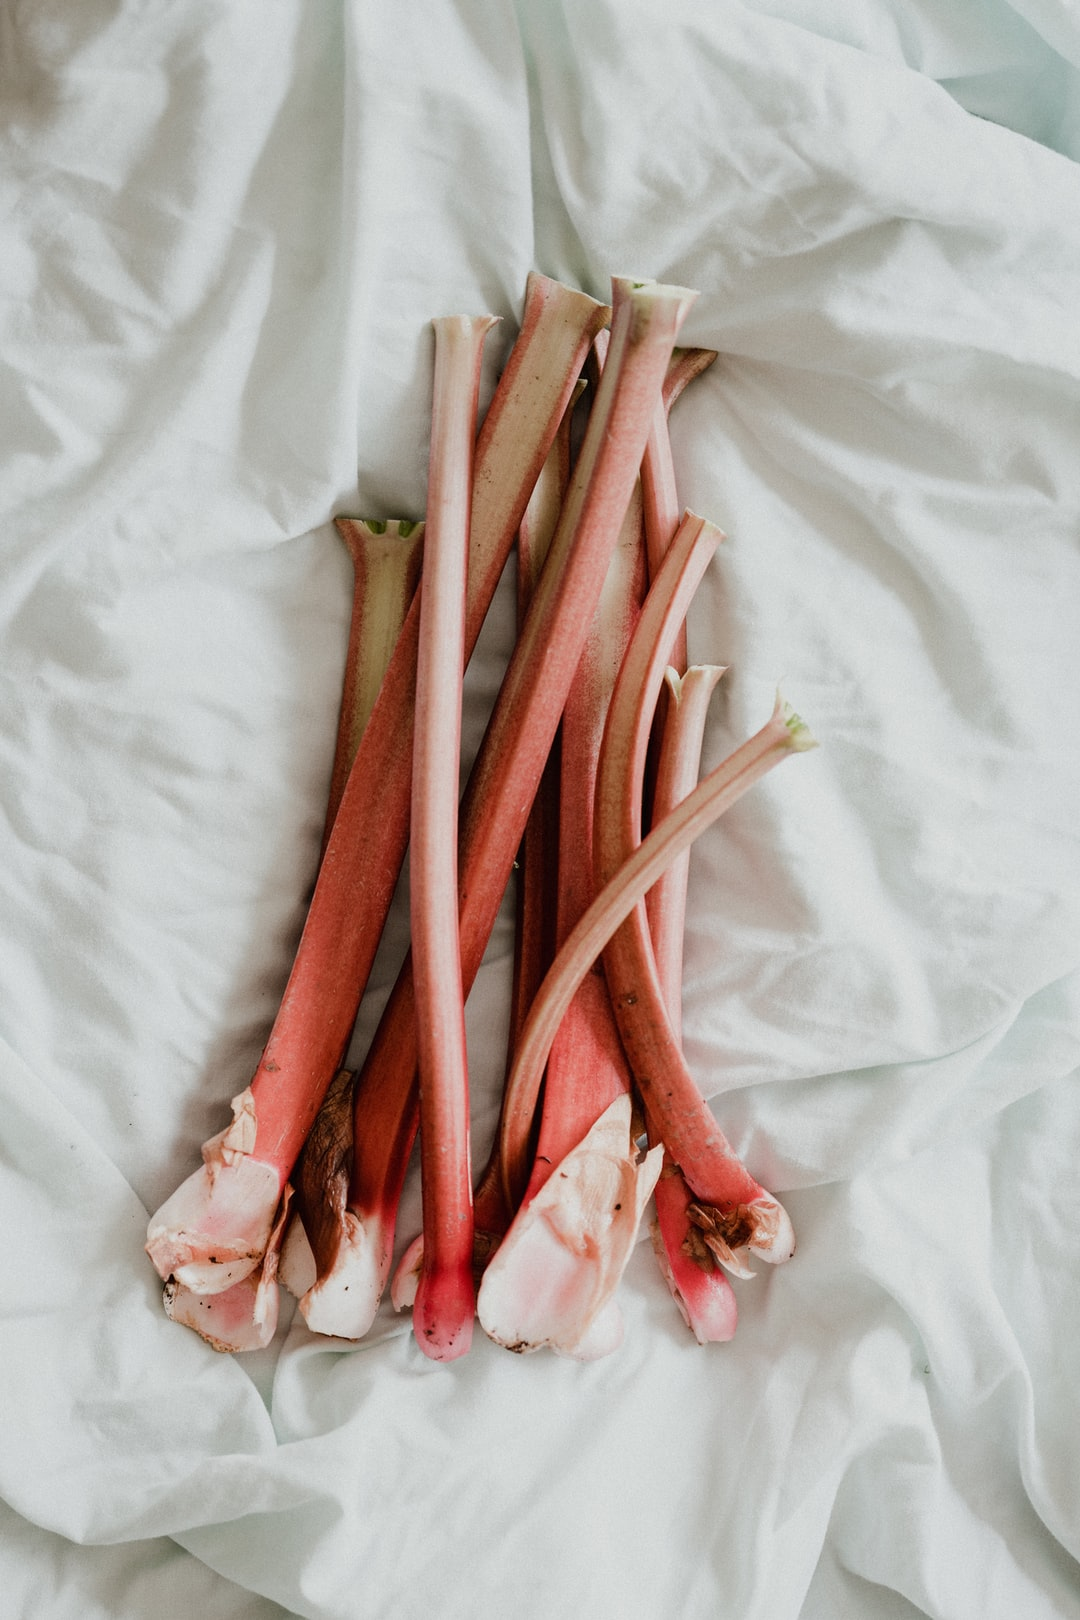 Rhubarb, fresh from the garden